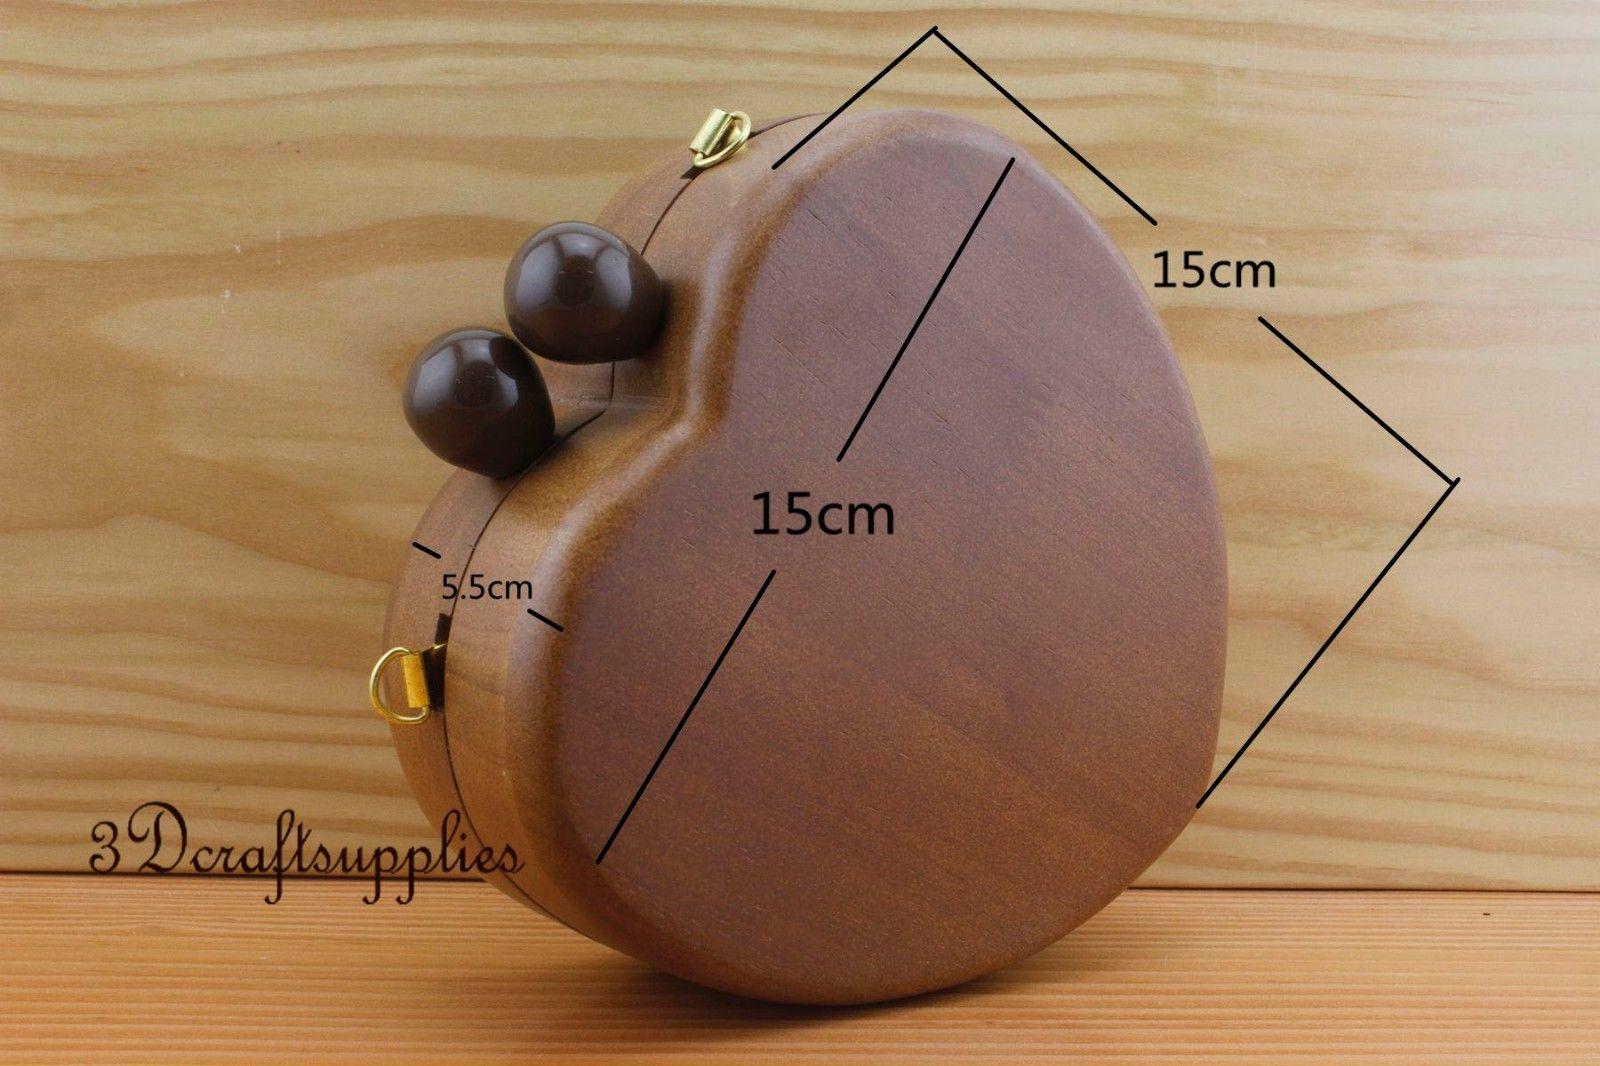 wood purse frame wooden box heart shape dark brown 6 inch x 6 inch M76